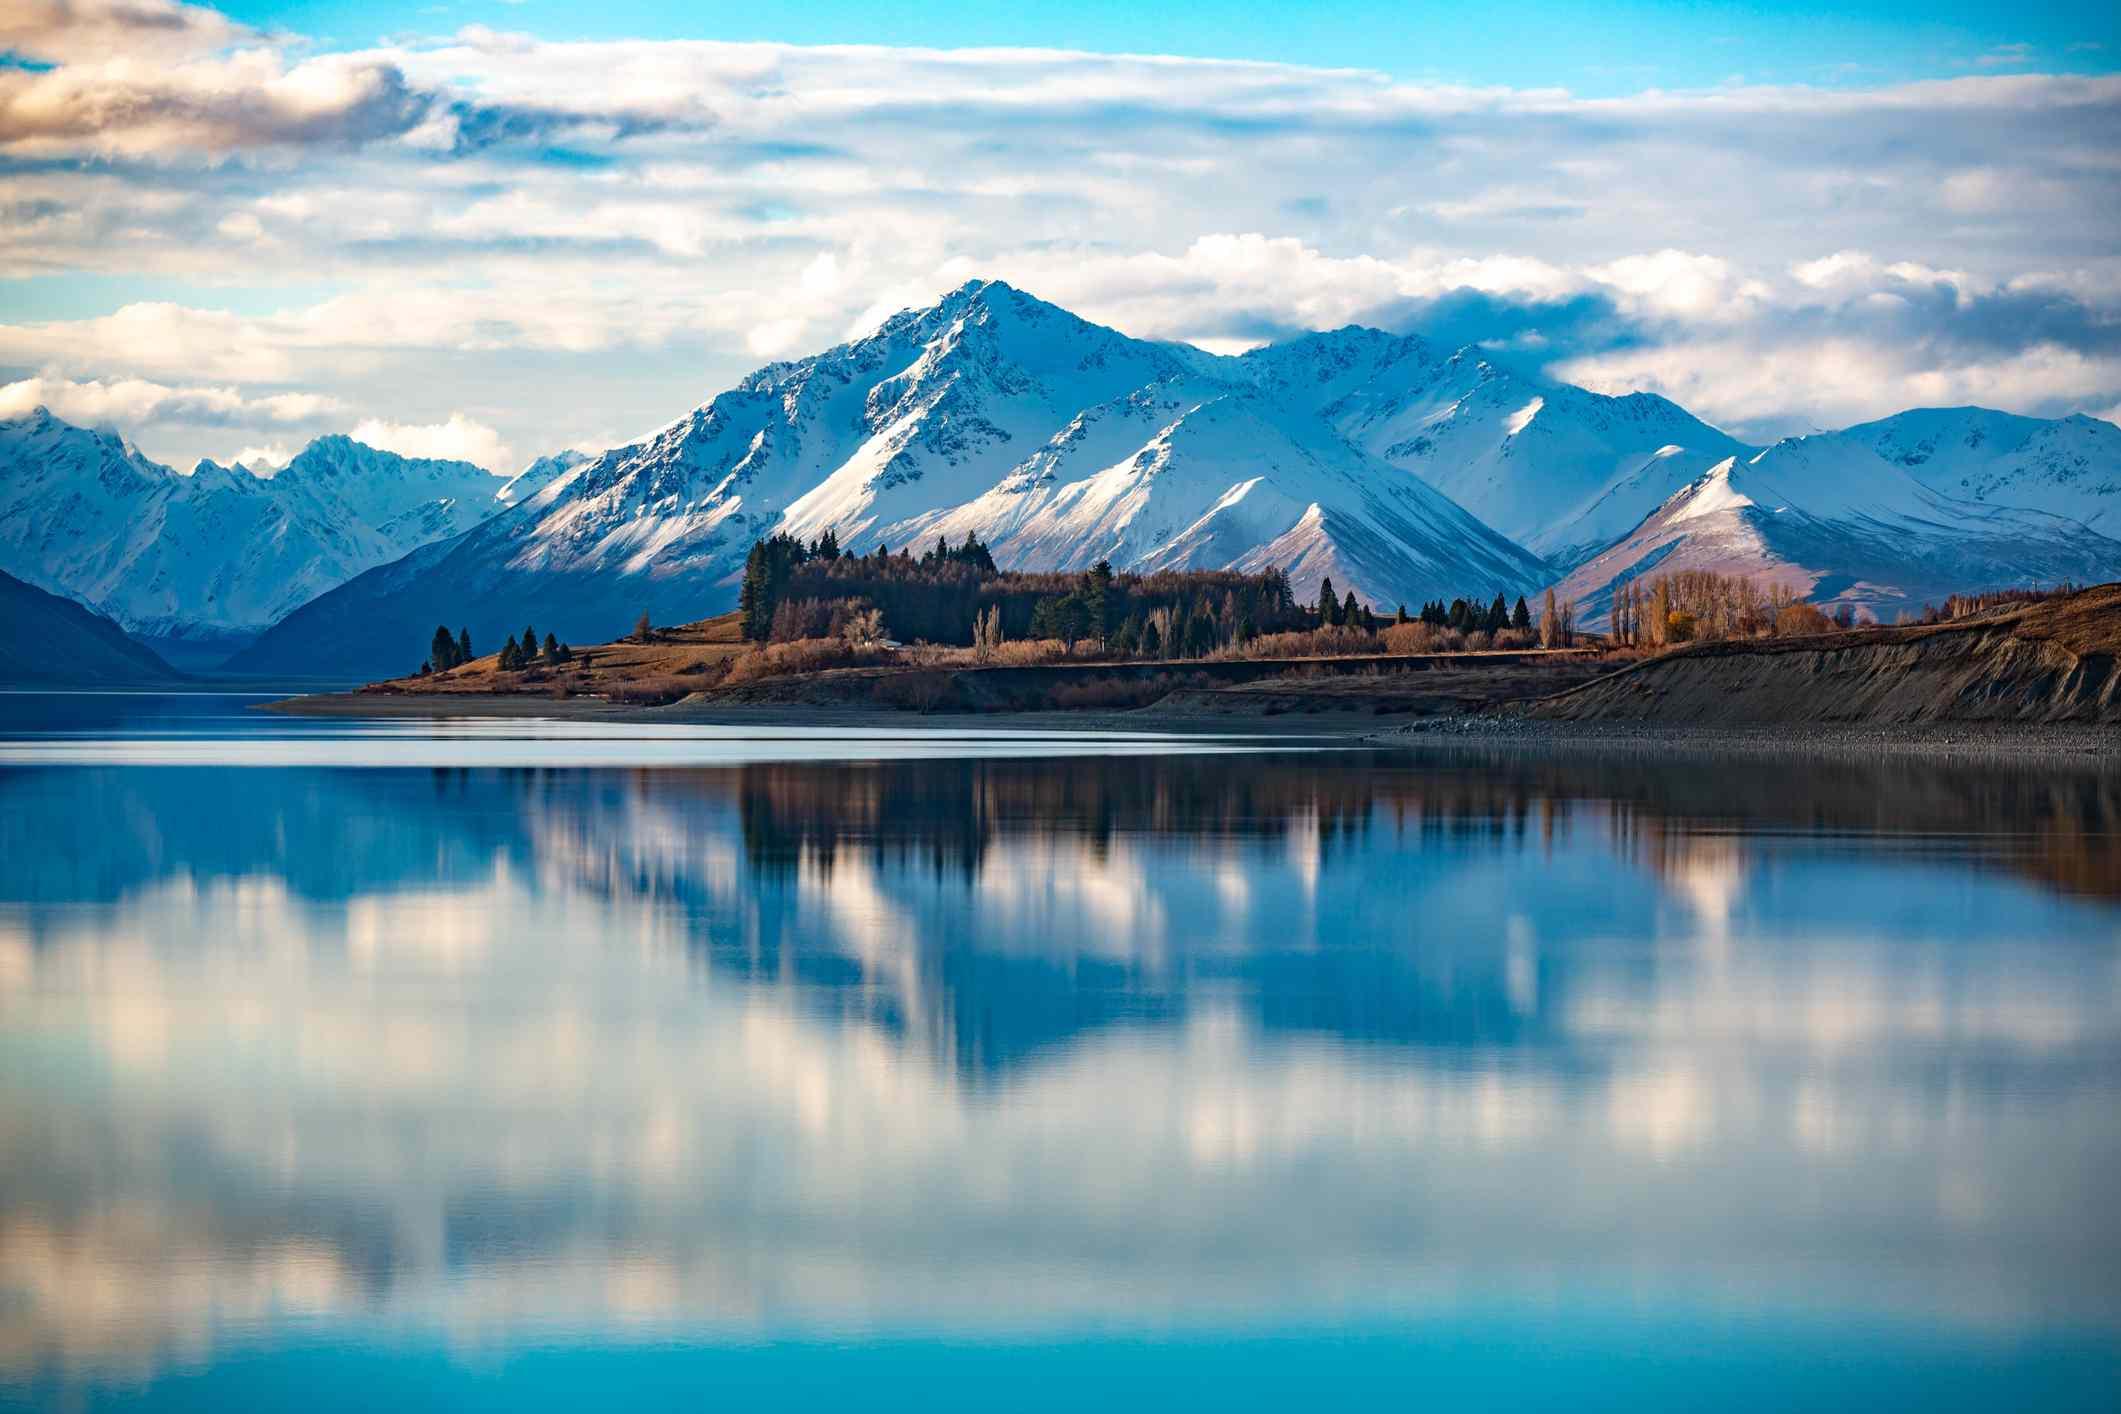 snowy mountains reflected in blue Lake Tekapo